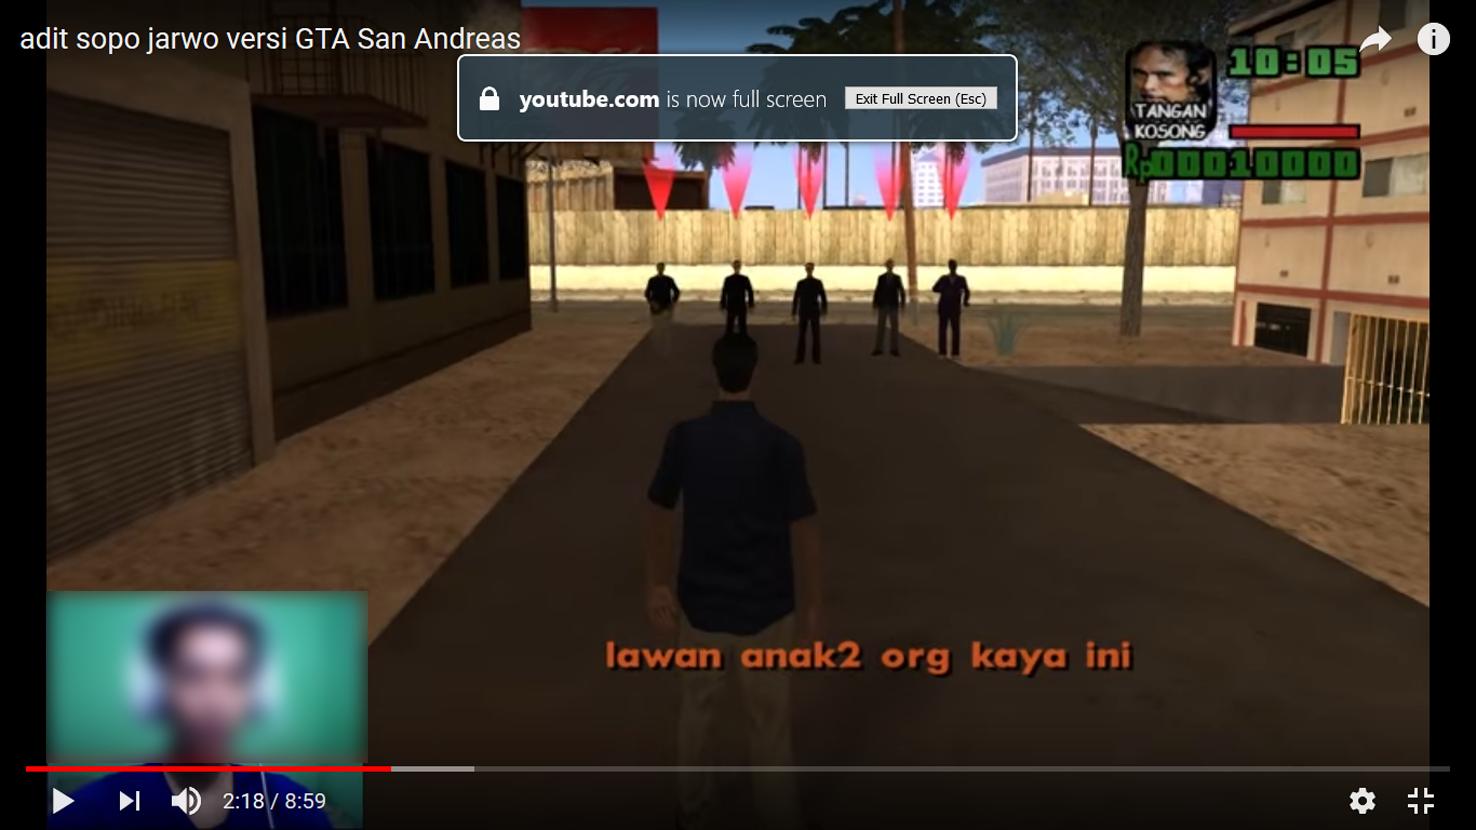 video palsu adit sopo jarwo2.png